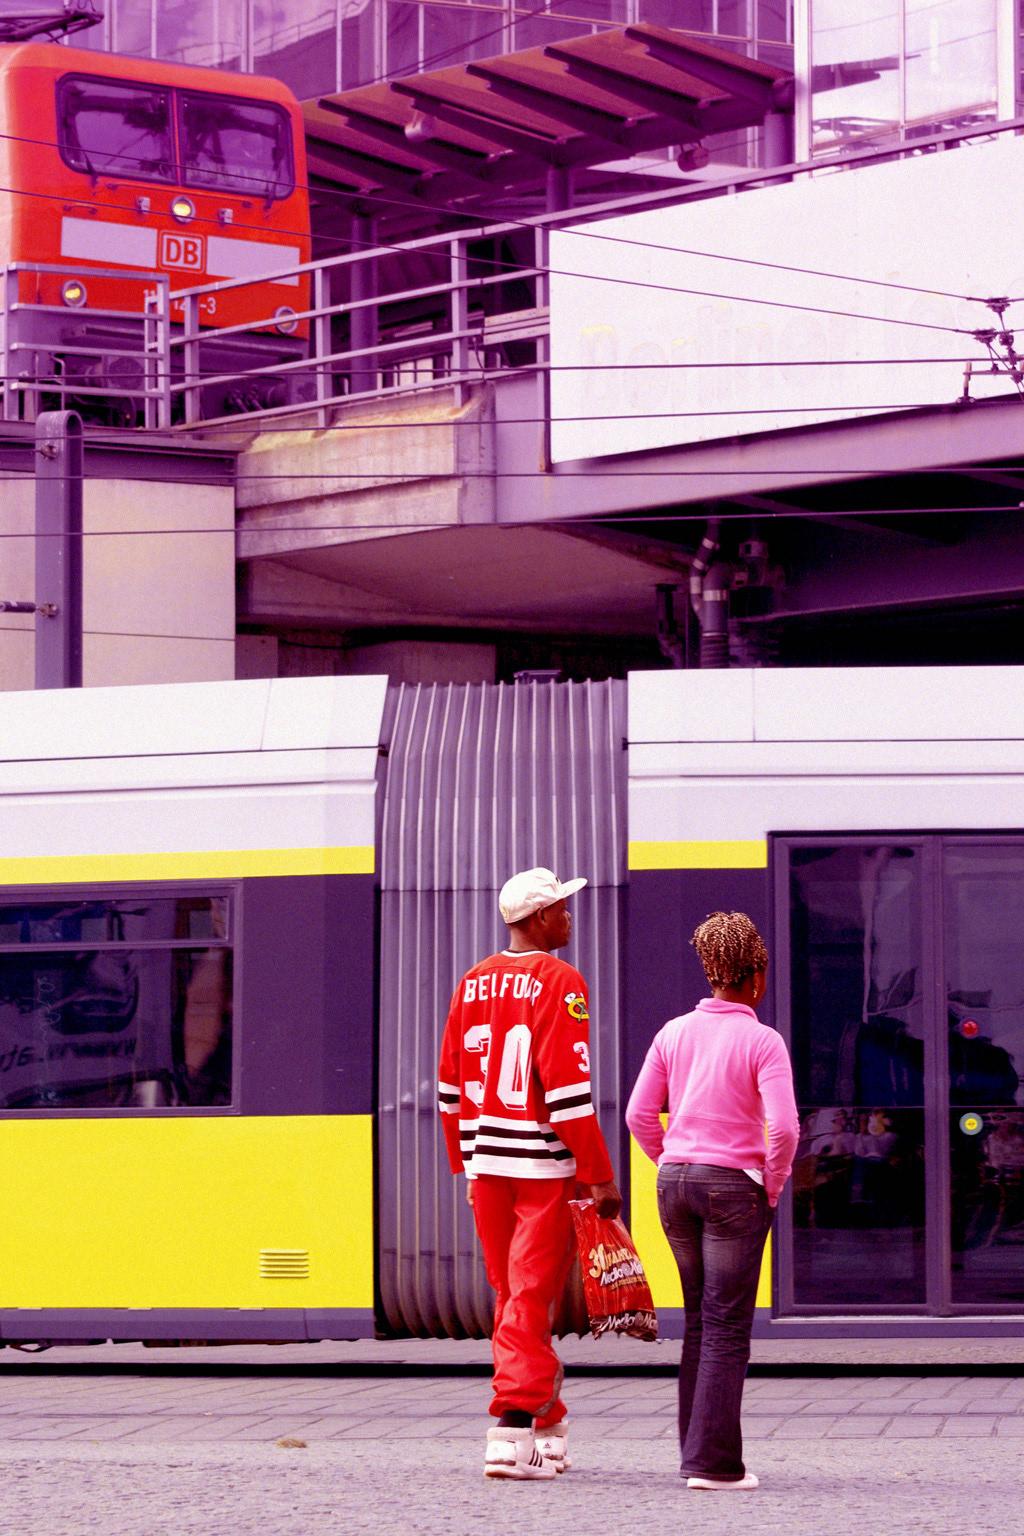 einscommanull Tino Schwanemann City Life photographic essay Cities Urban berlin London colorful colors saturation